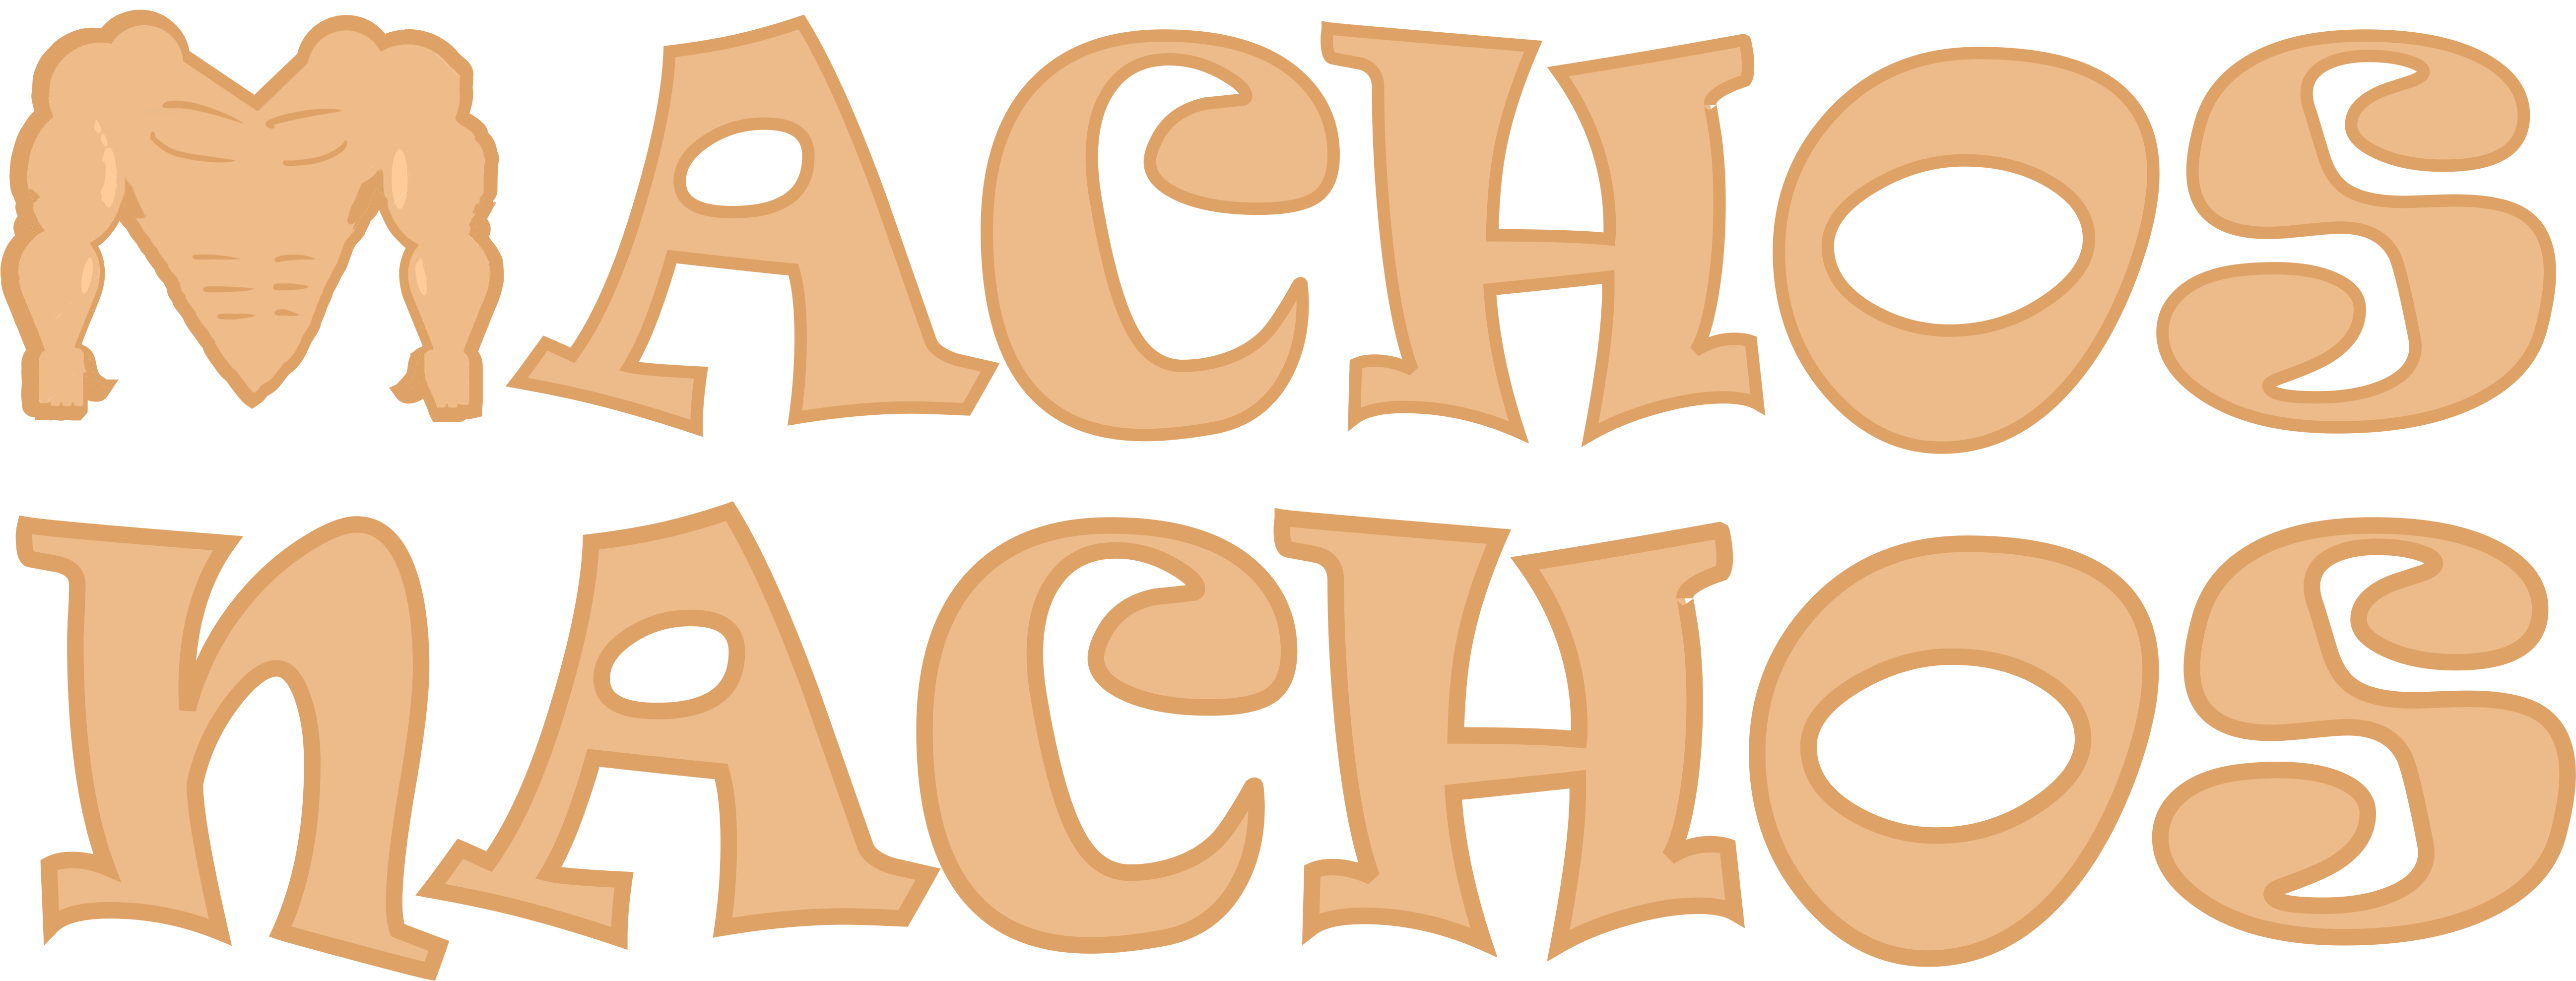 Nacho clipart single. Home page of machos